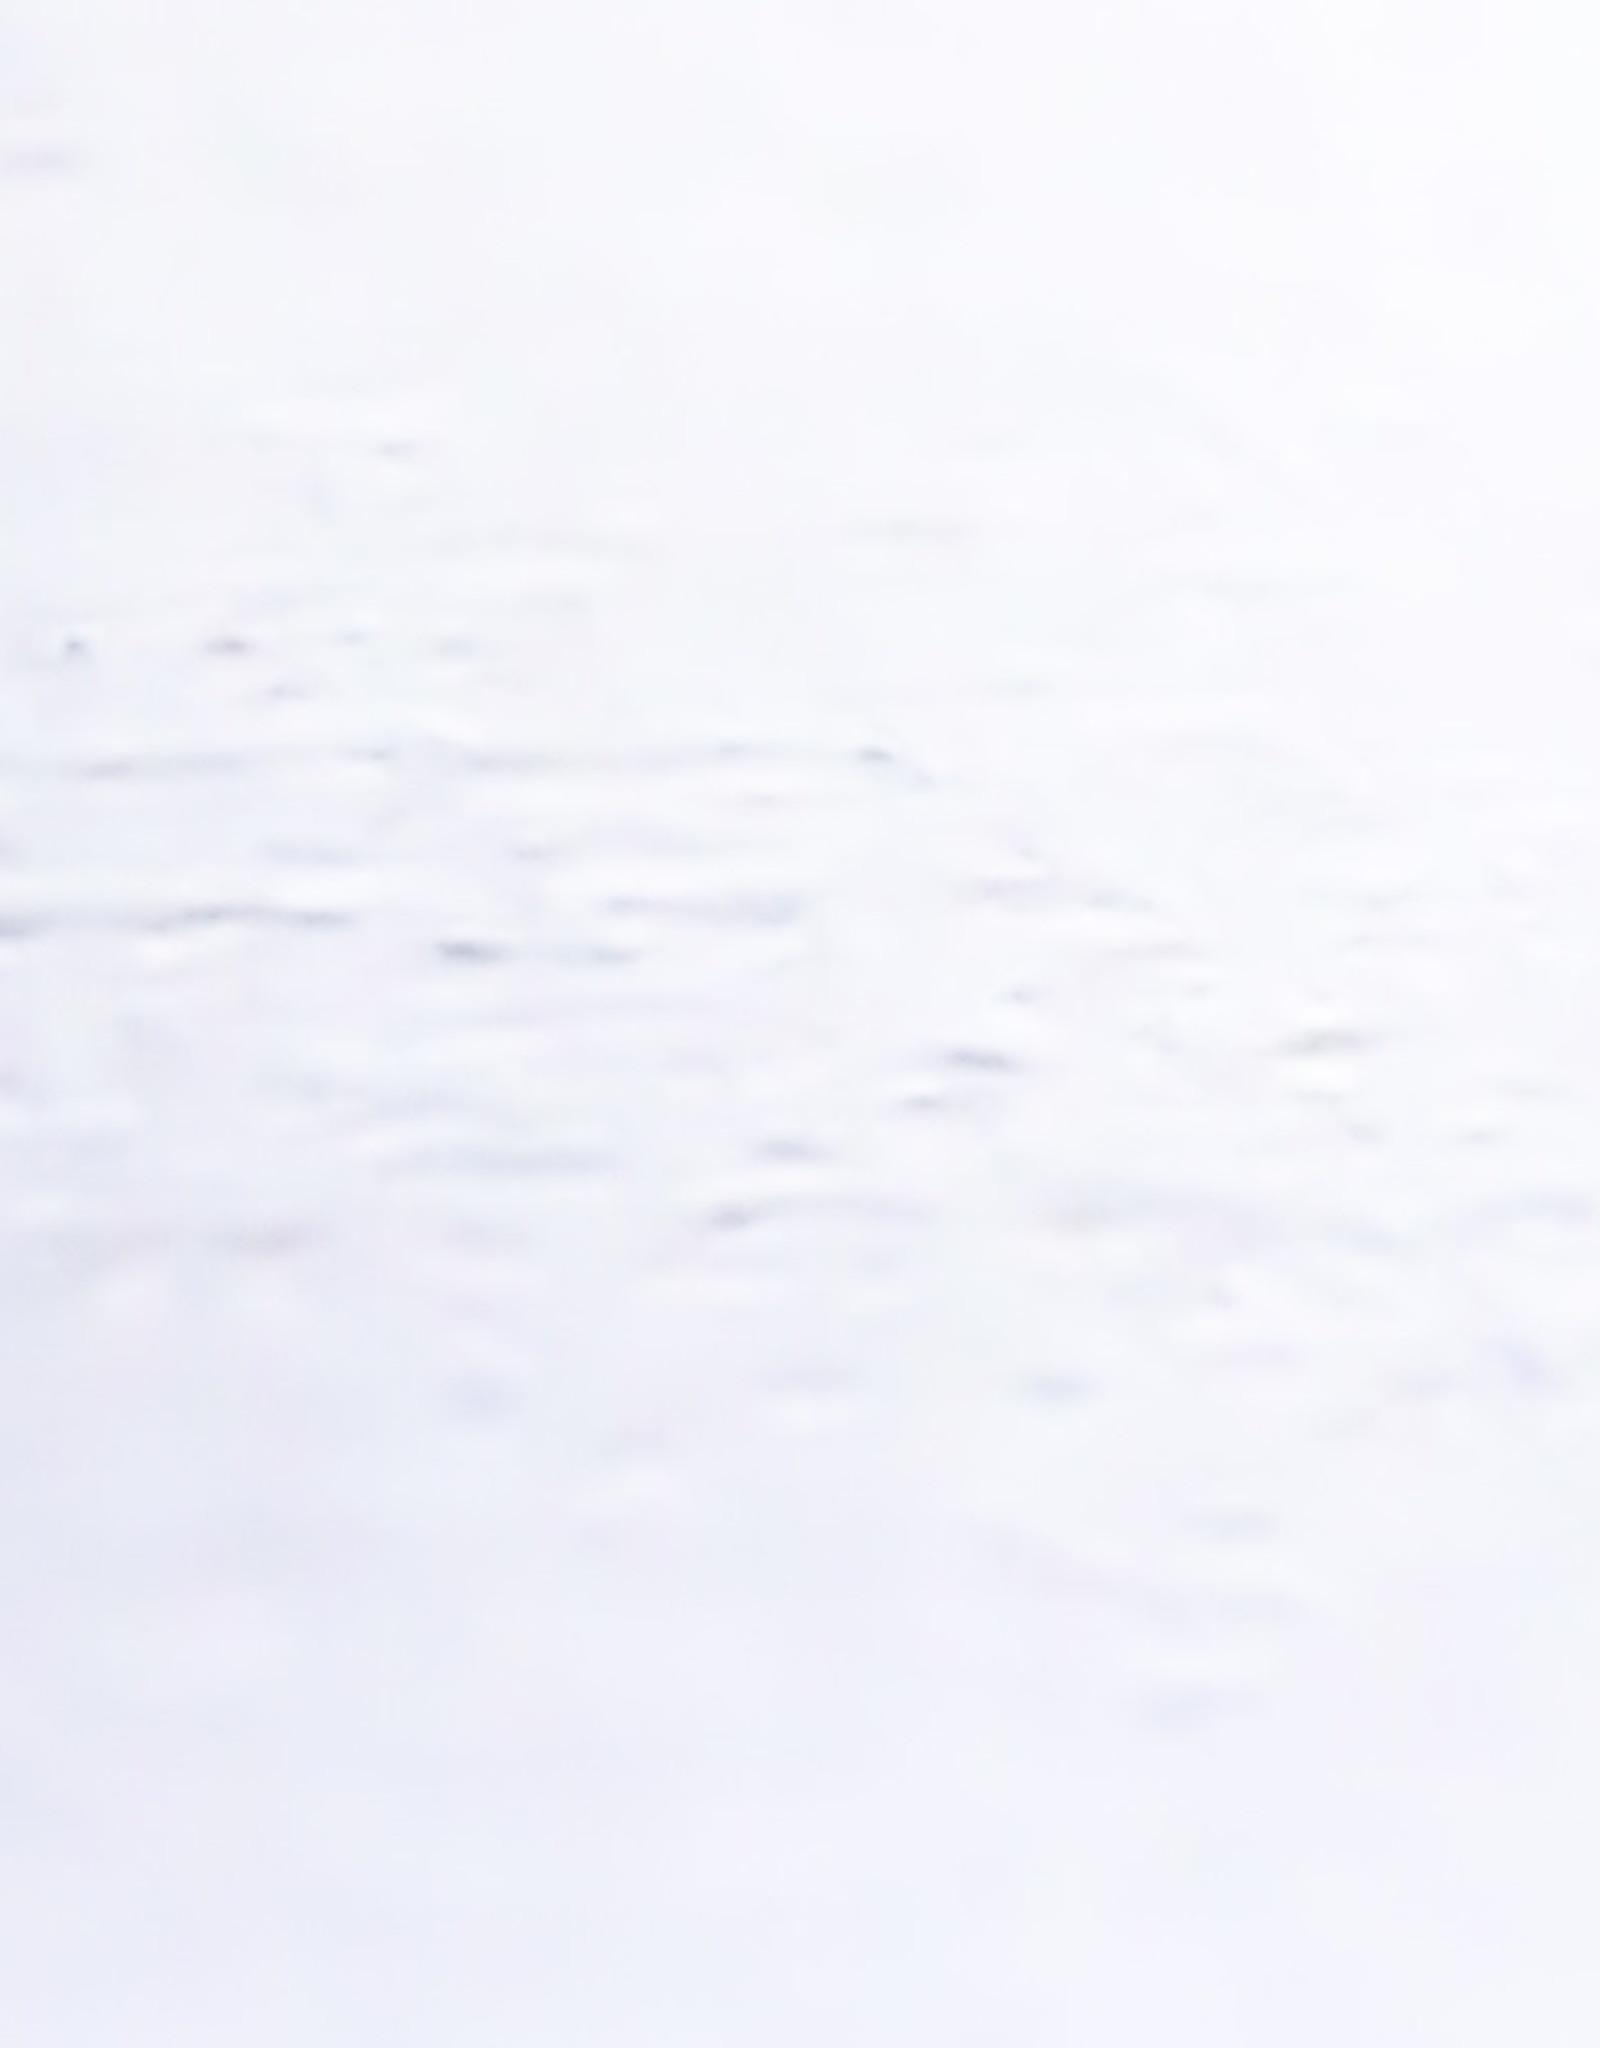 "SMLT Panoramic Watercolor Pad, Cold Press 260gsm, 7.75"" x 15.5"", 20 Sheets"